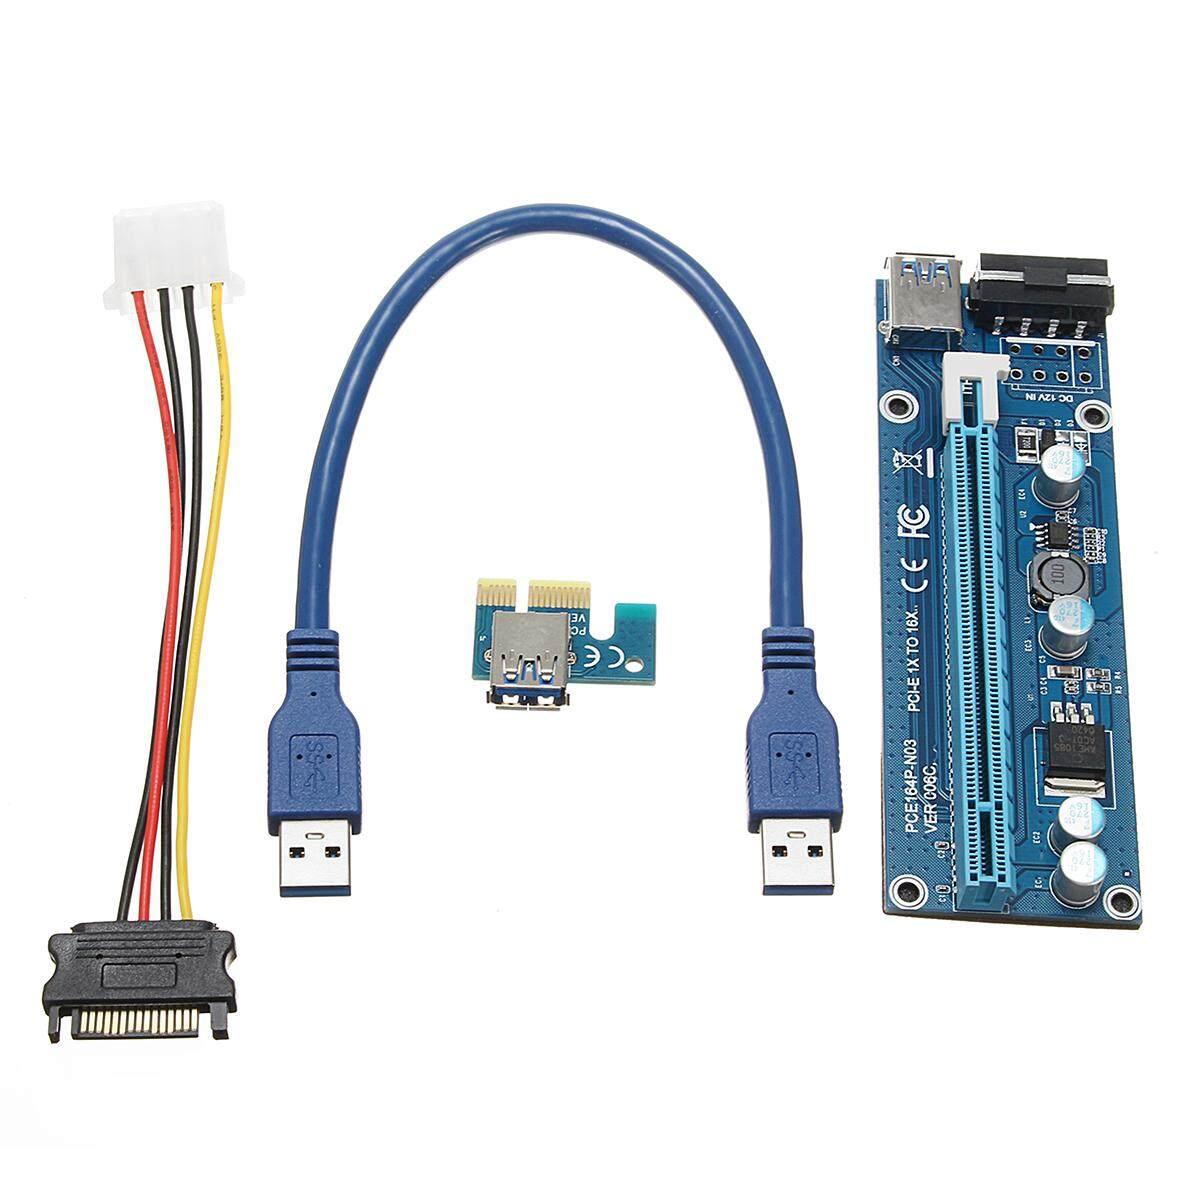 3pcs PCI-E Express USB3.0 1x to16x Extender Riser Card Adapter SATA Power Cable